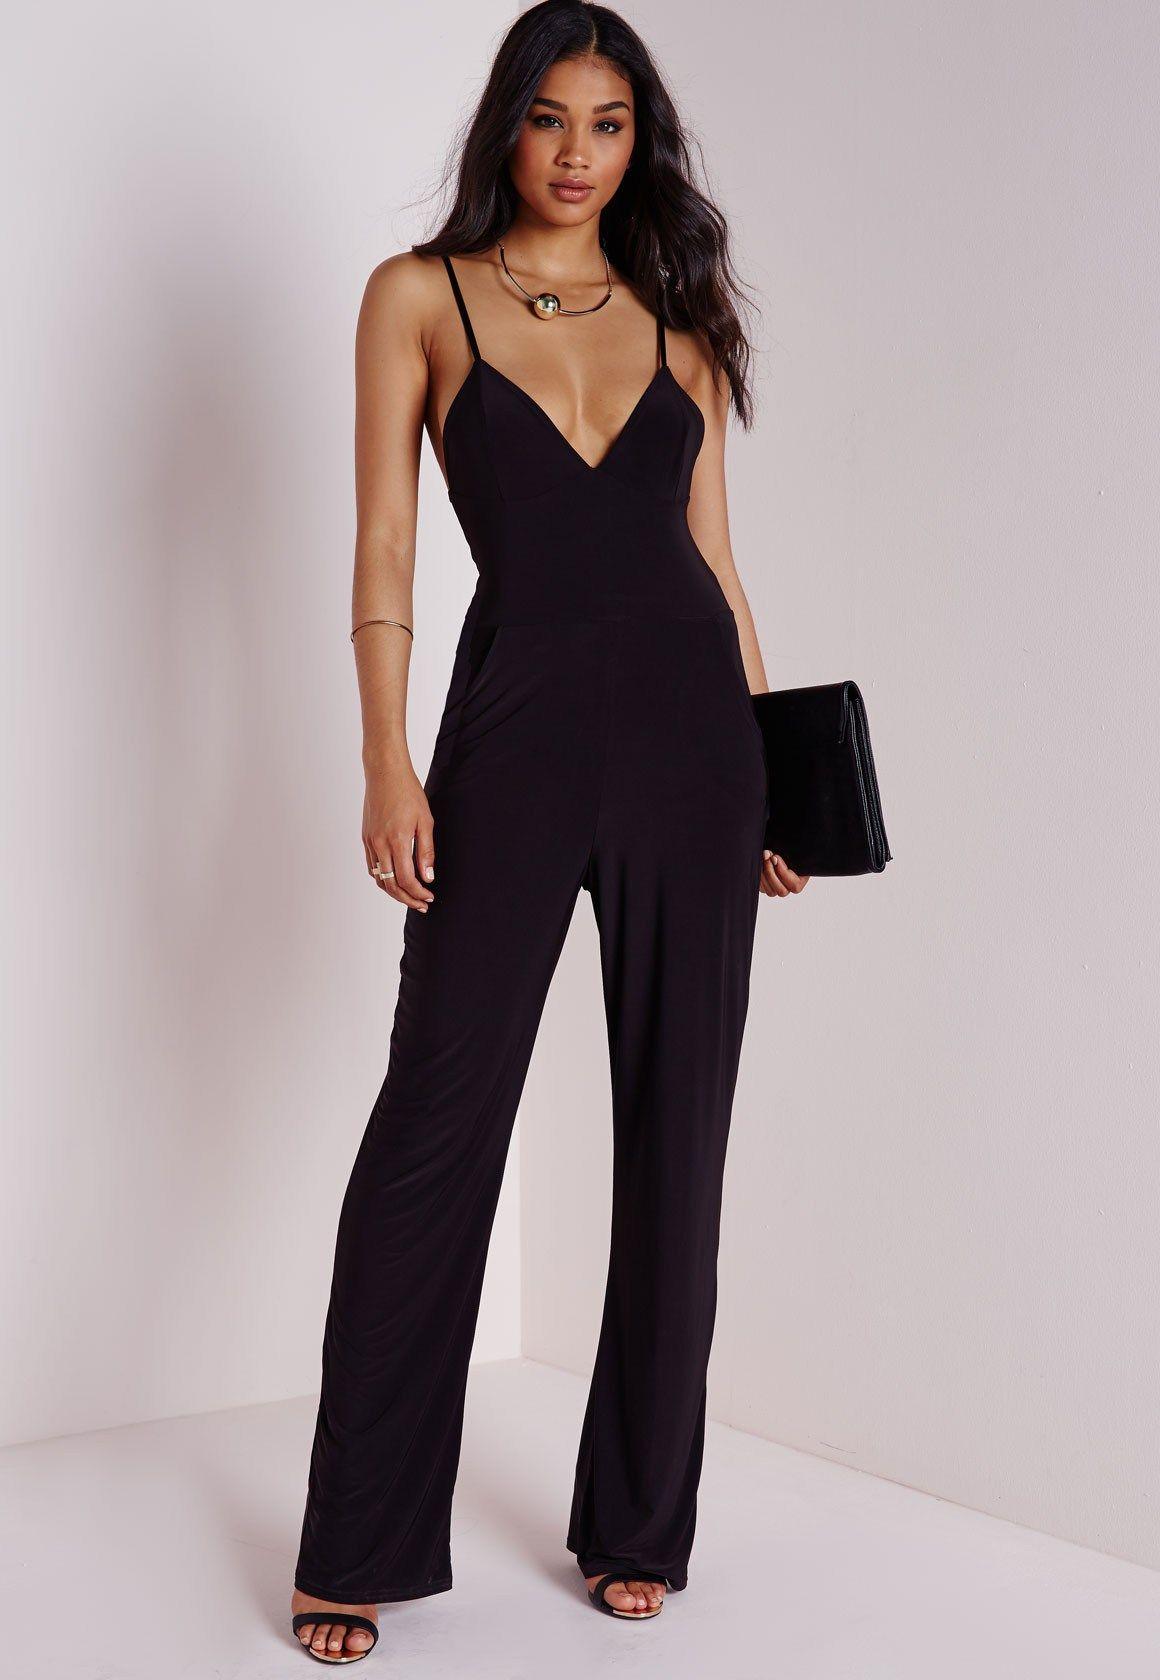 b92f4e083b3 Awesome Black Jumpsuit   Elegant Black Jumpsuit. Awesome Black Jumpsuit    Elegant Black Jumpsuit Tall Women Fashion